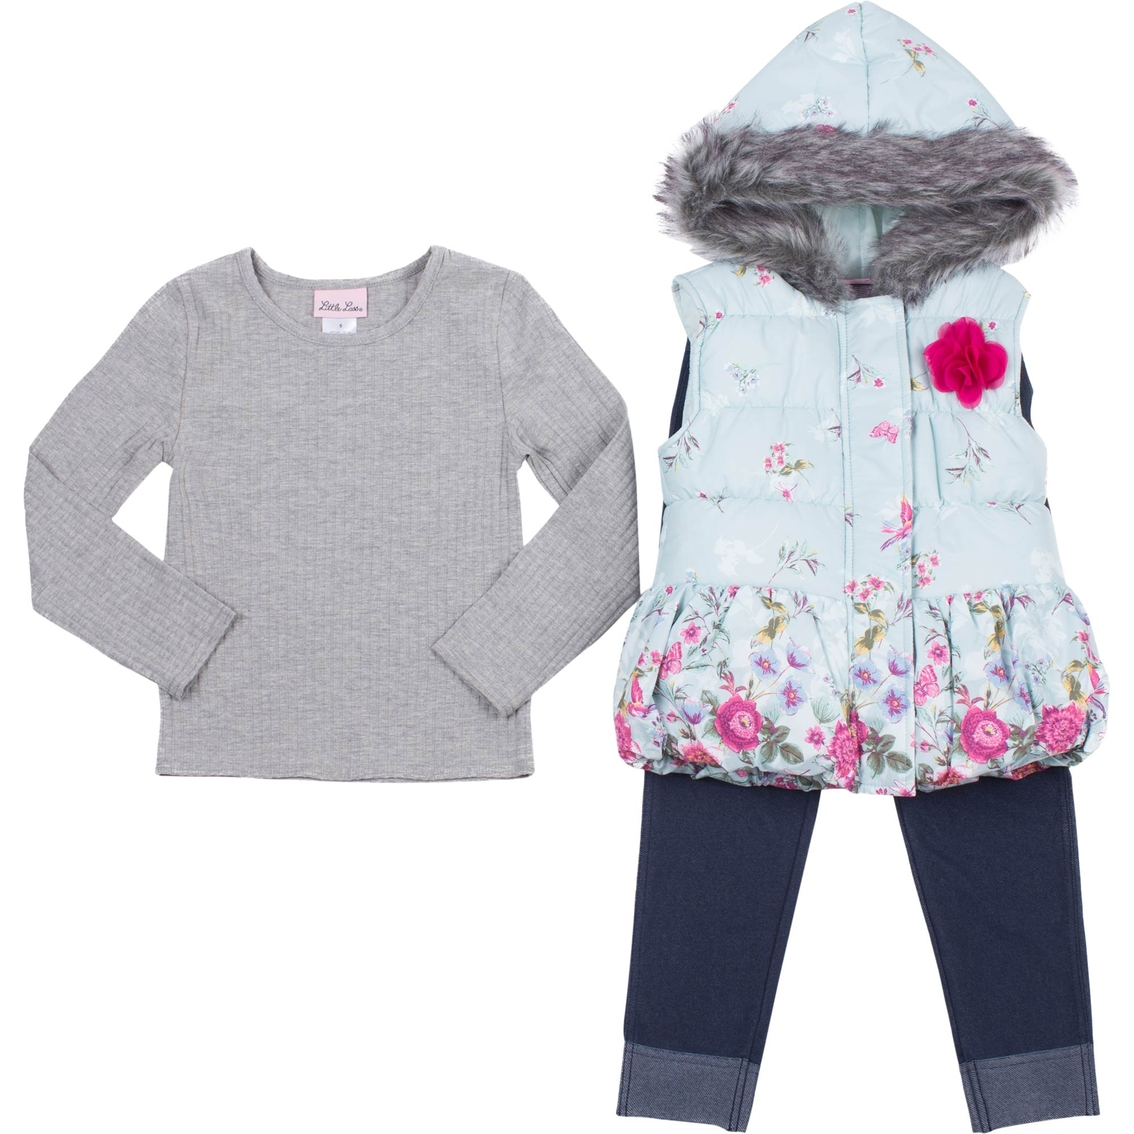 72c7ba0fc1b6 Little Lass Toddler Girls 3 Pc. Floral Puffer Vest Set   Toddler ...